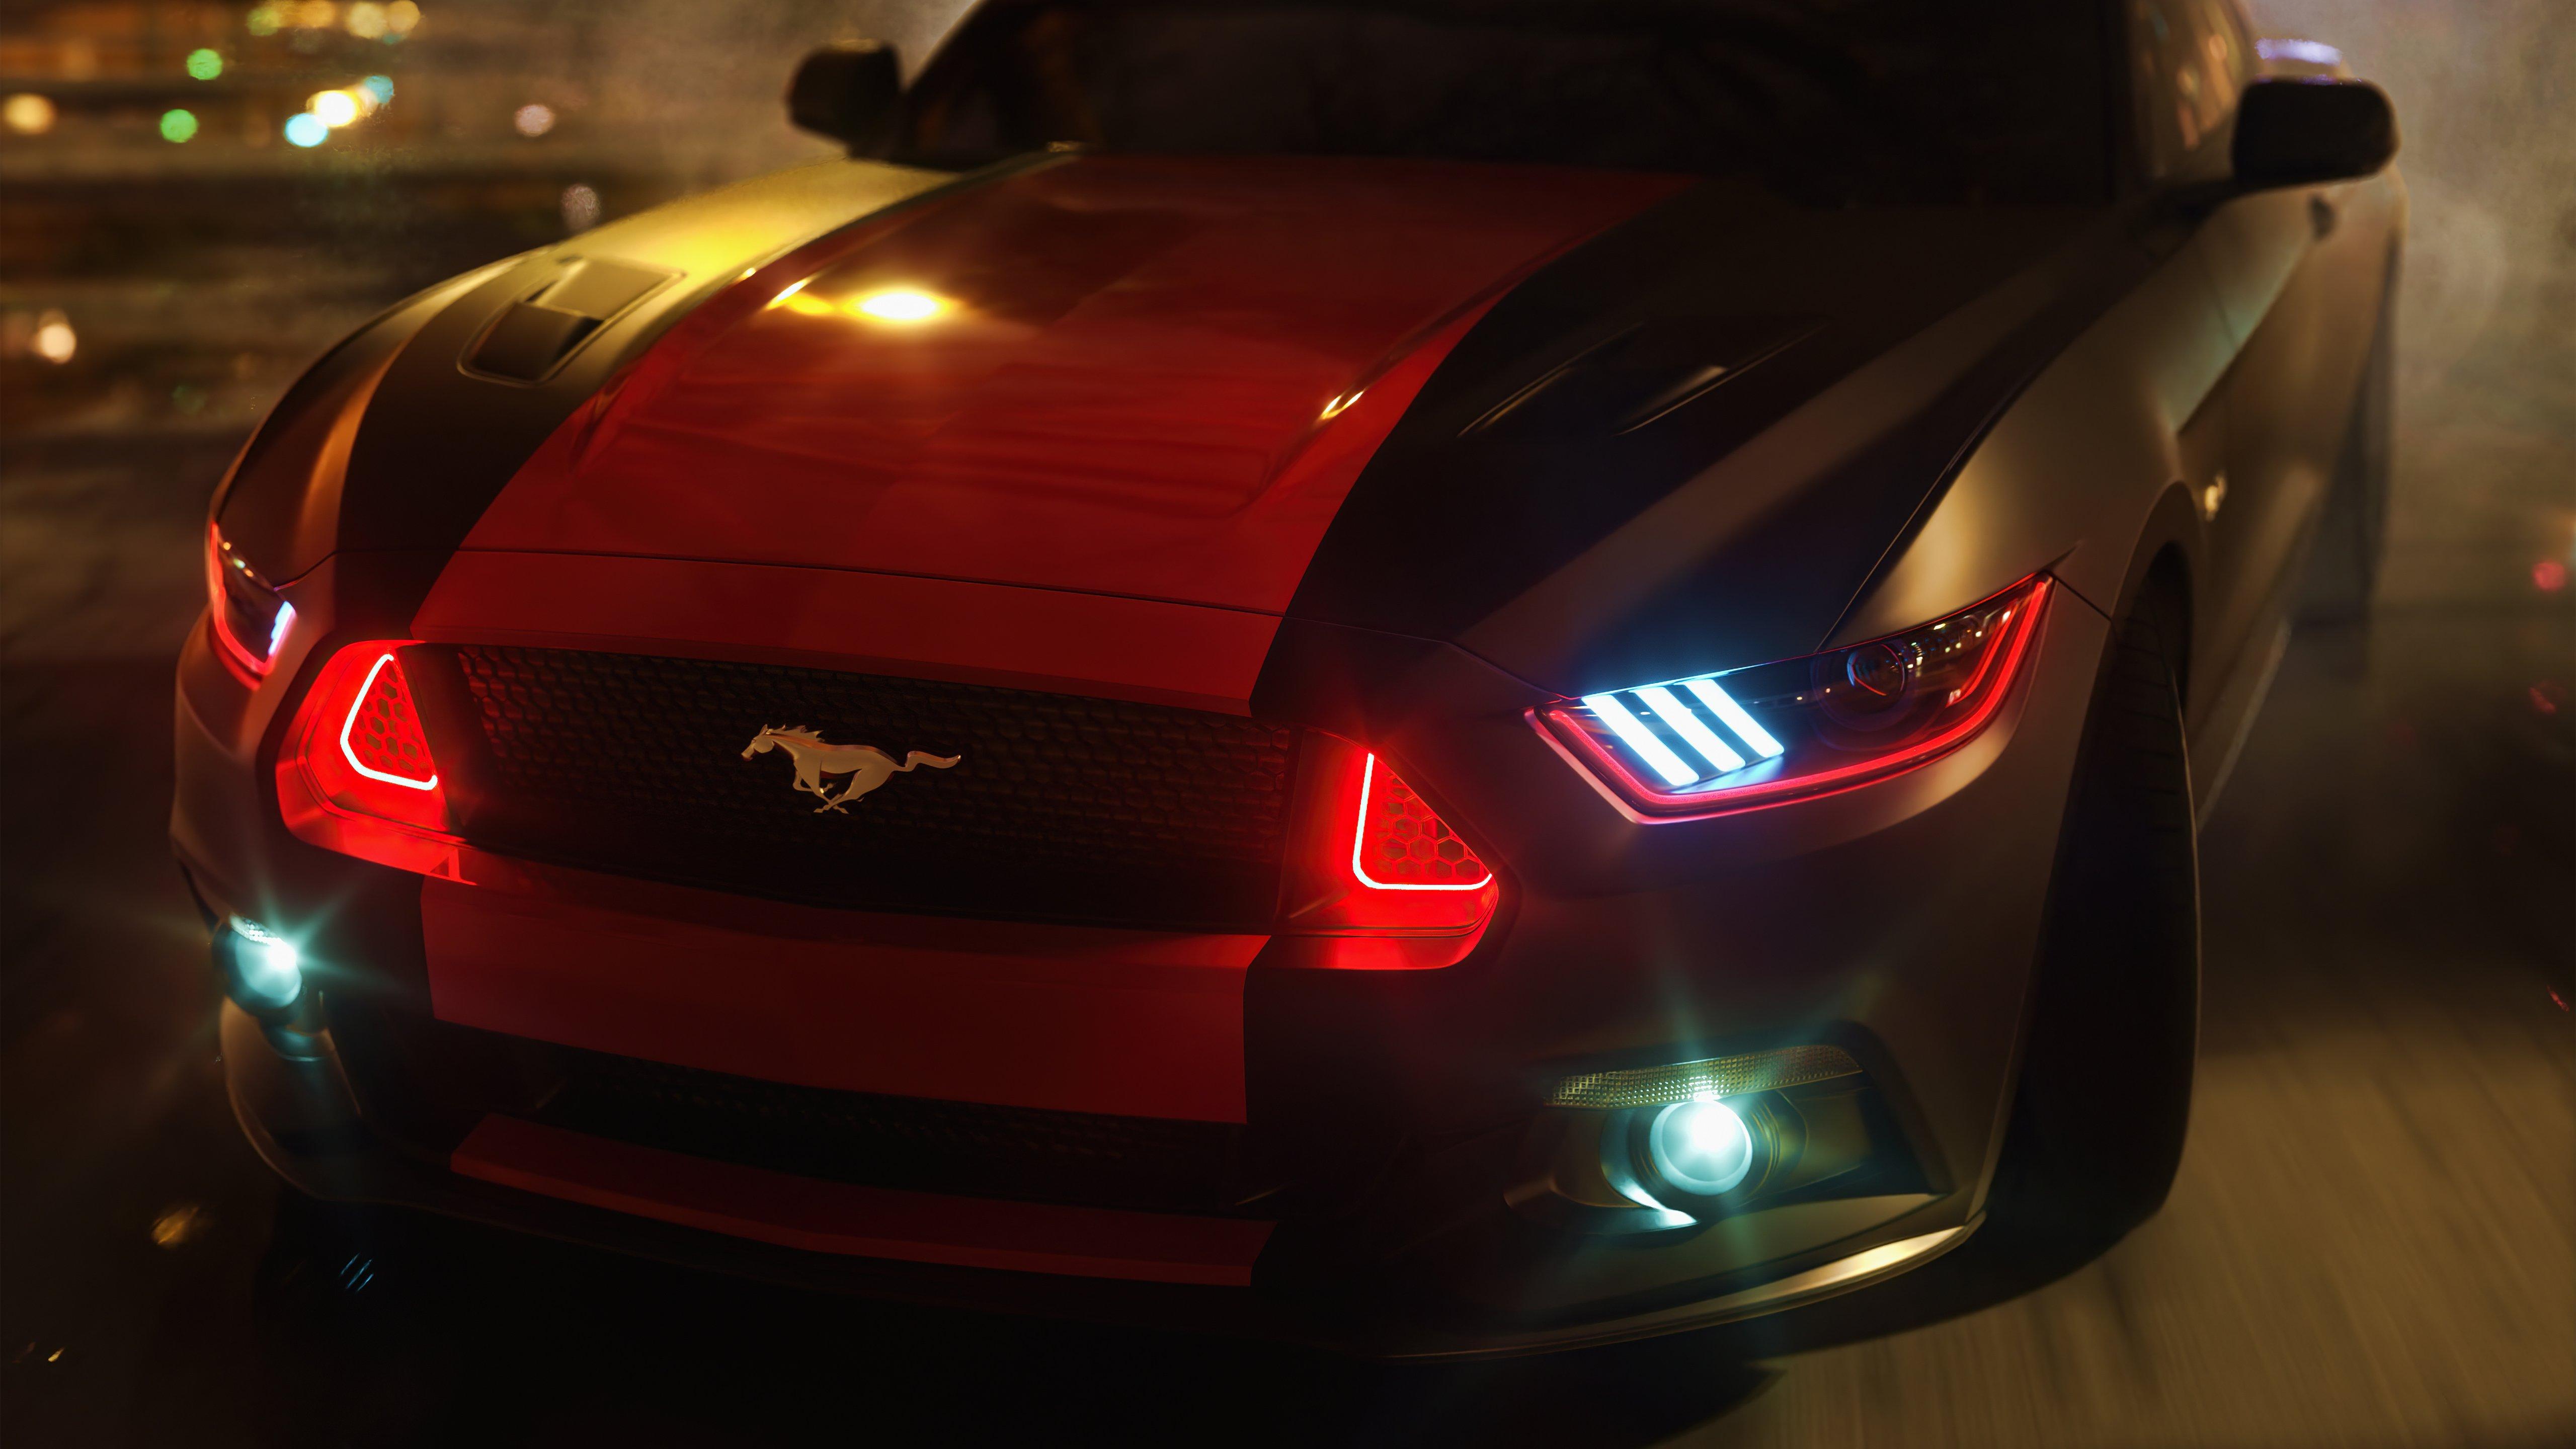 Wallpaper Ford Mustang